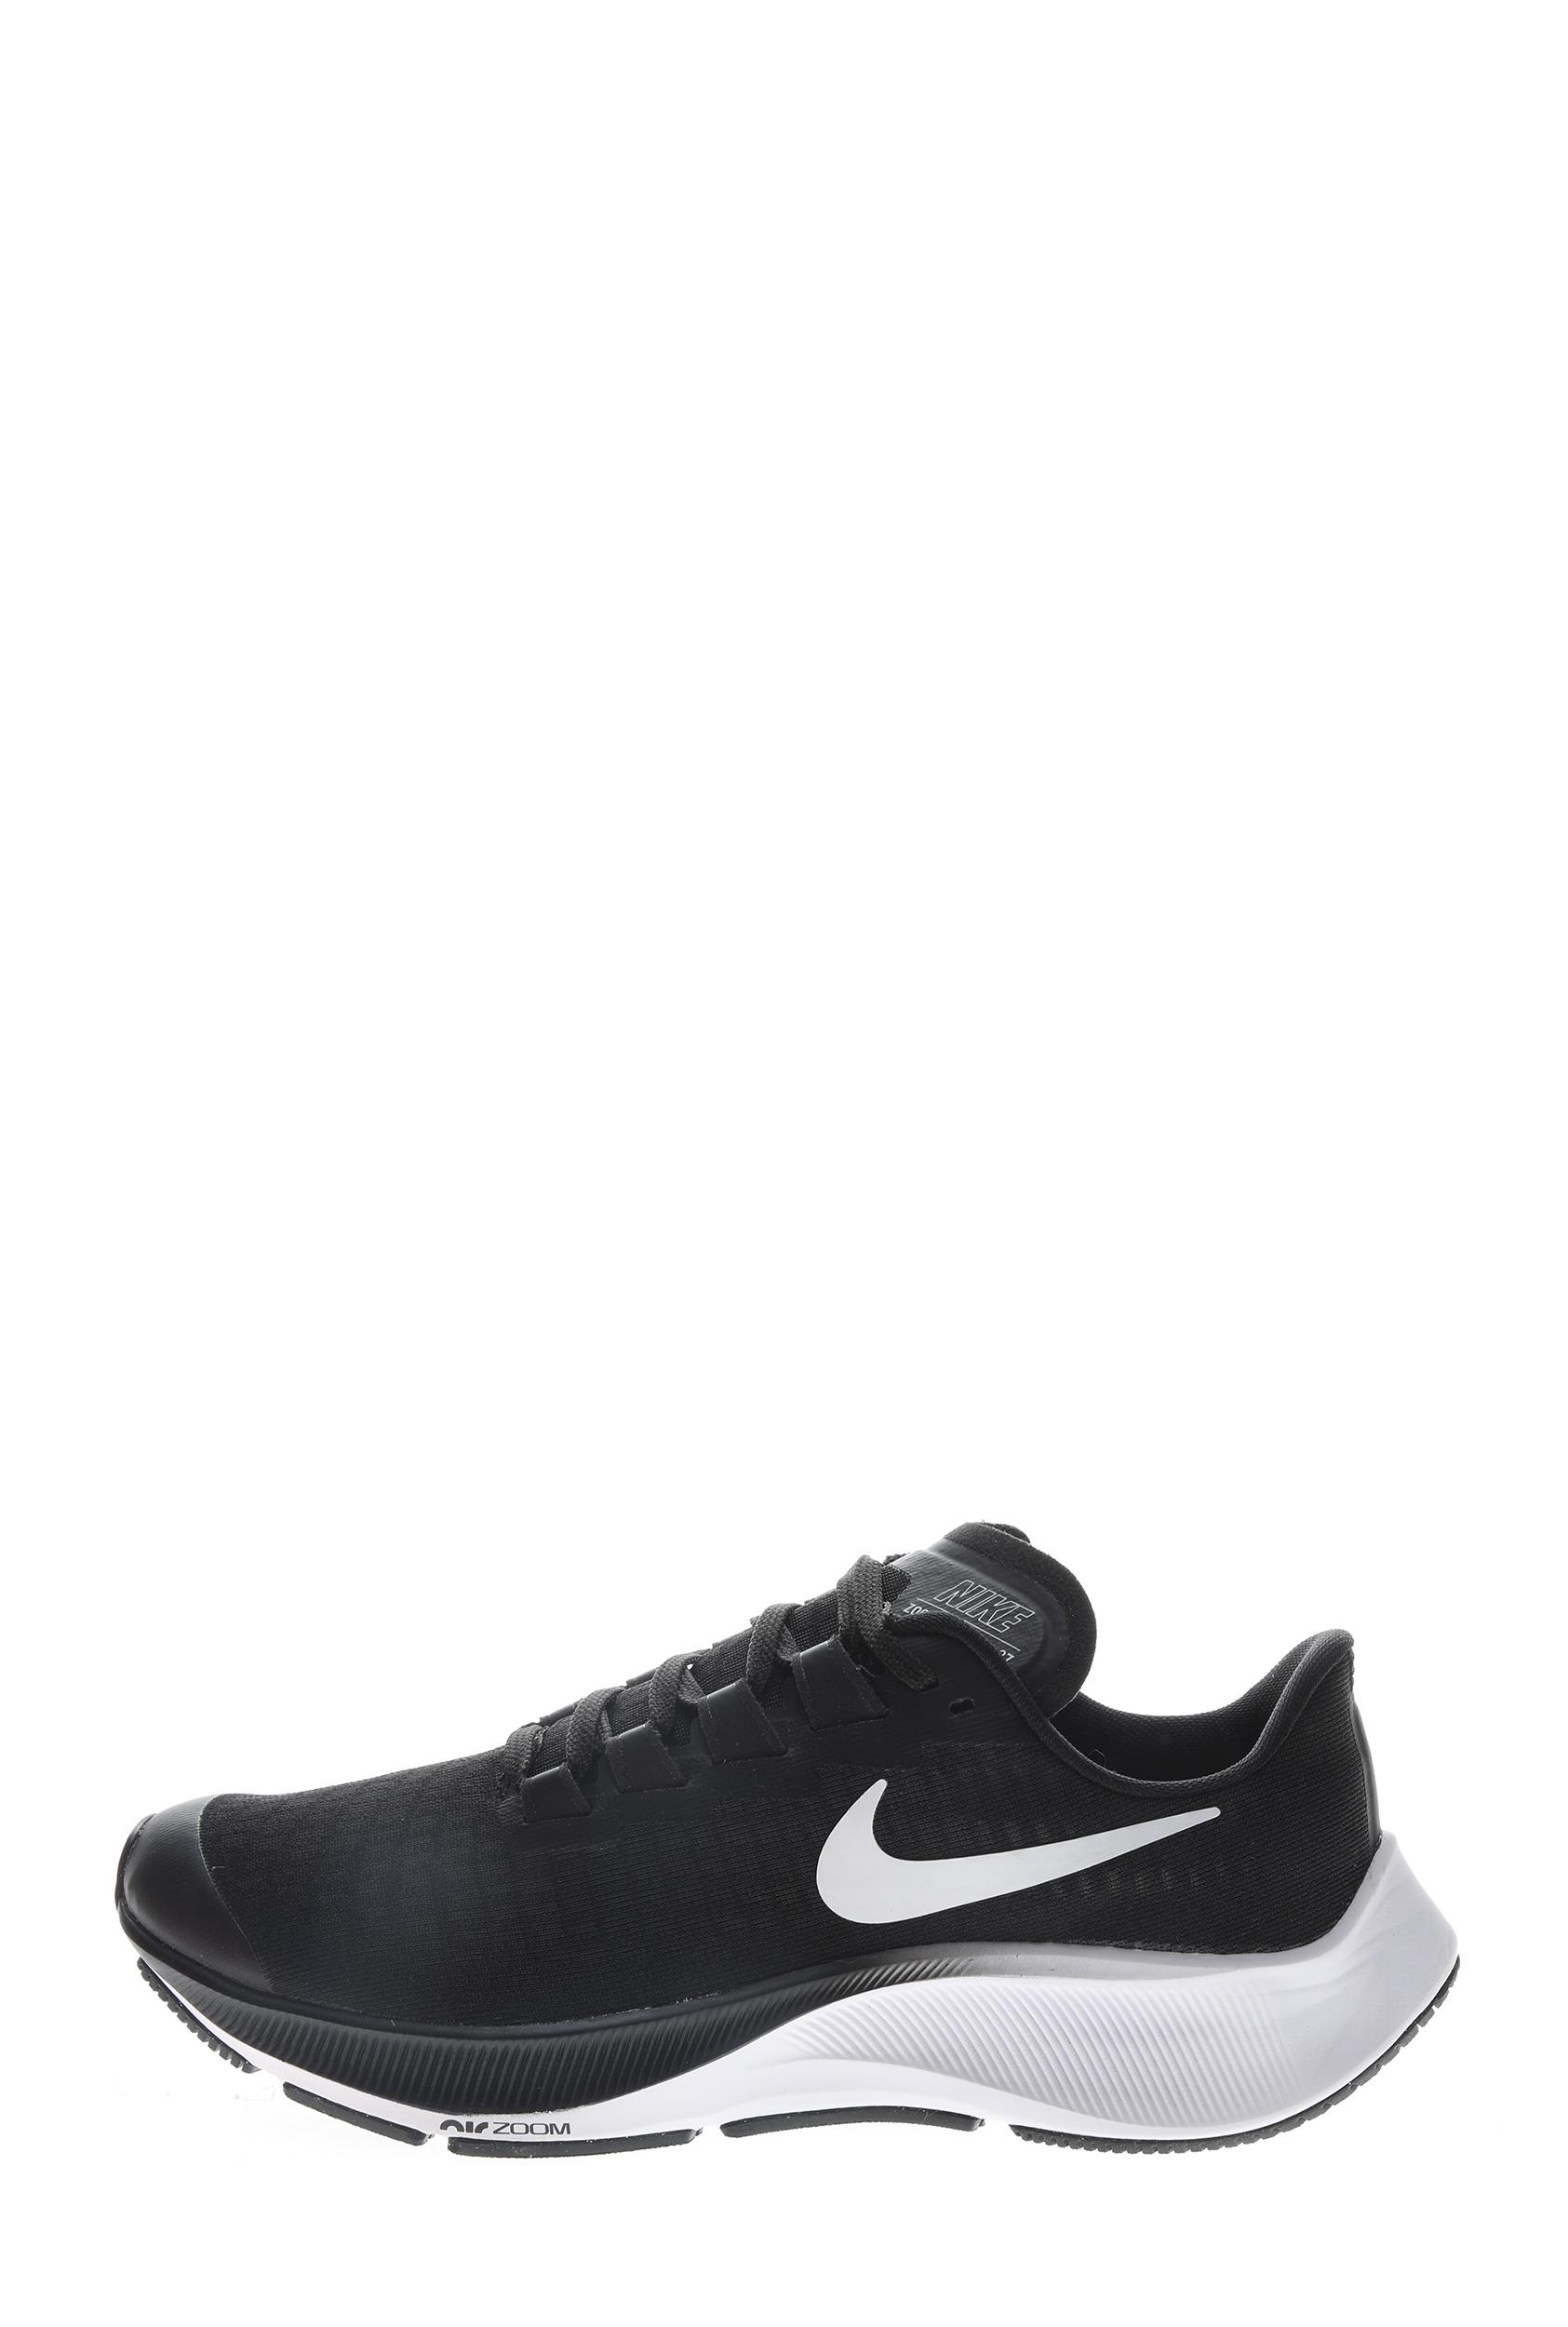 NIKE – Παιιδικά αθλητικά παπούτσια NIKE AIR ZOOM PEGASUS 37 μαύρα